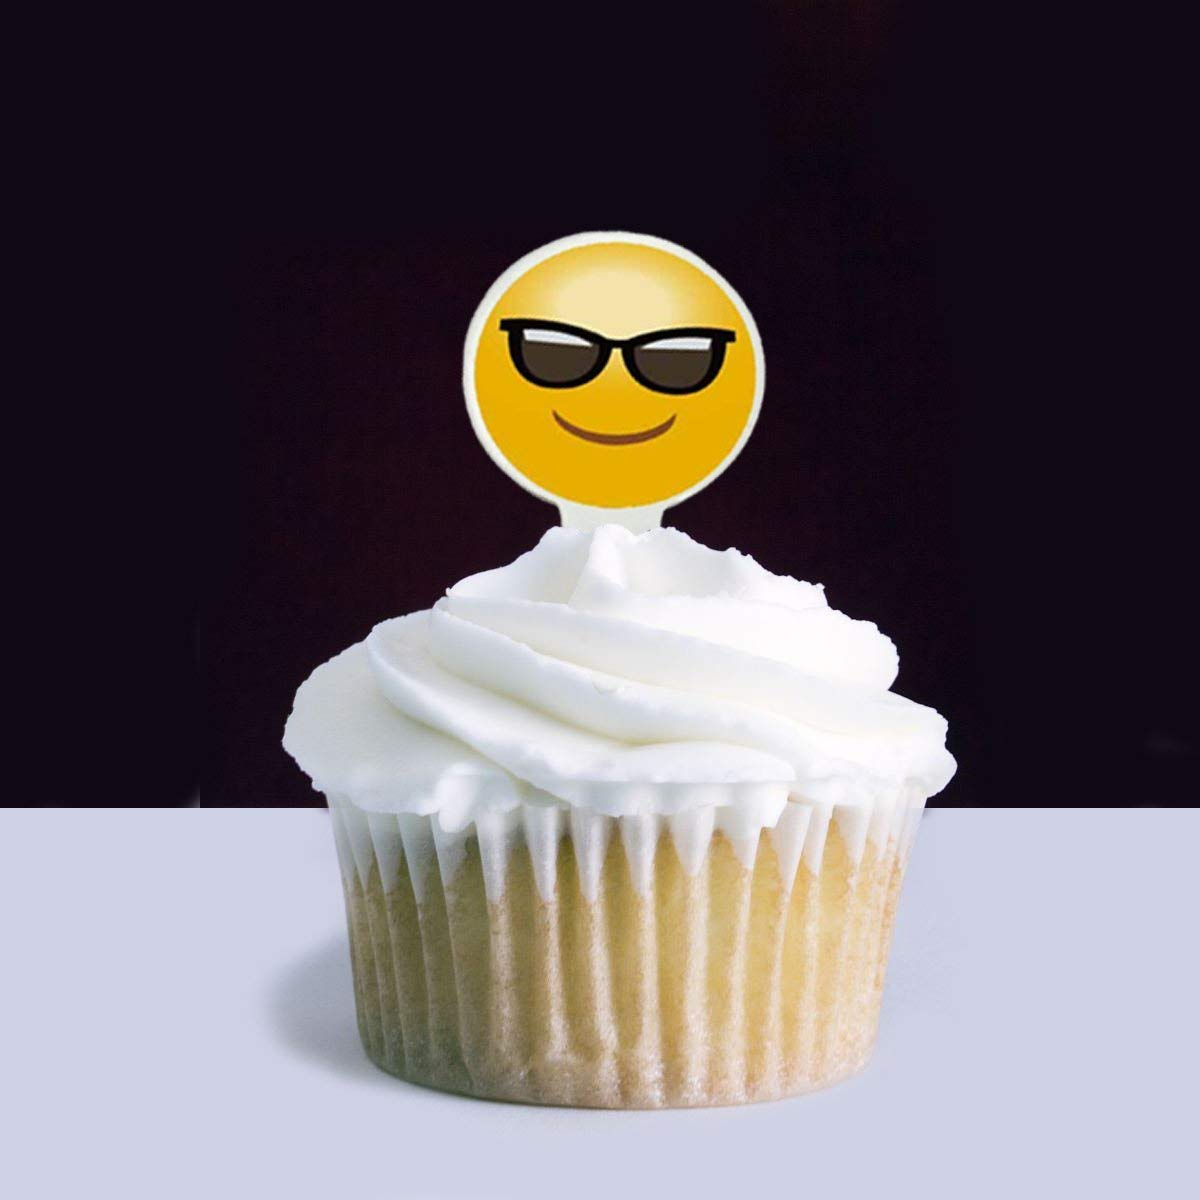 Emoji Cupcake Topper 50pcs Cake Picks Snack Decoration DIY Party Favors Kit for Birthday Wedding Baby Shower